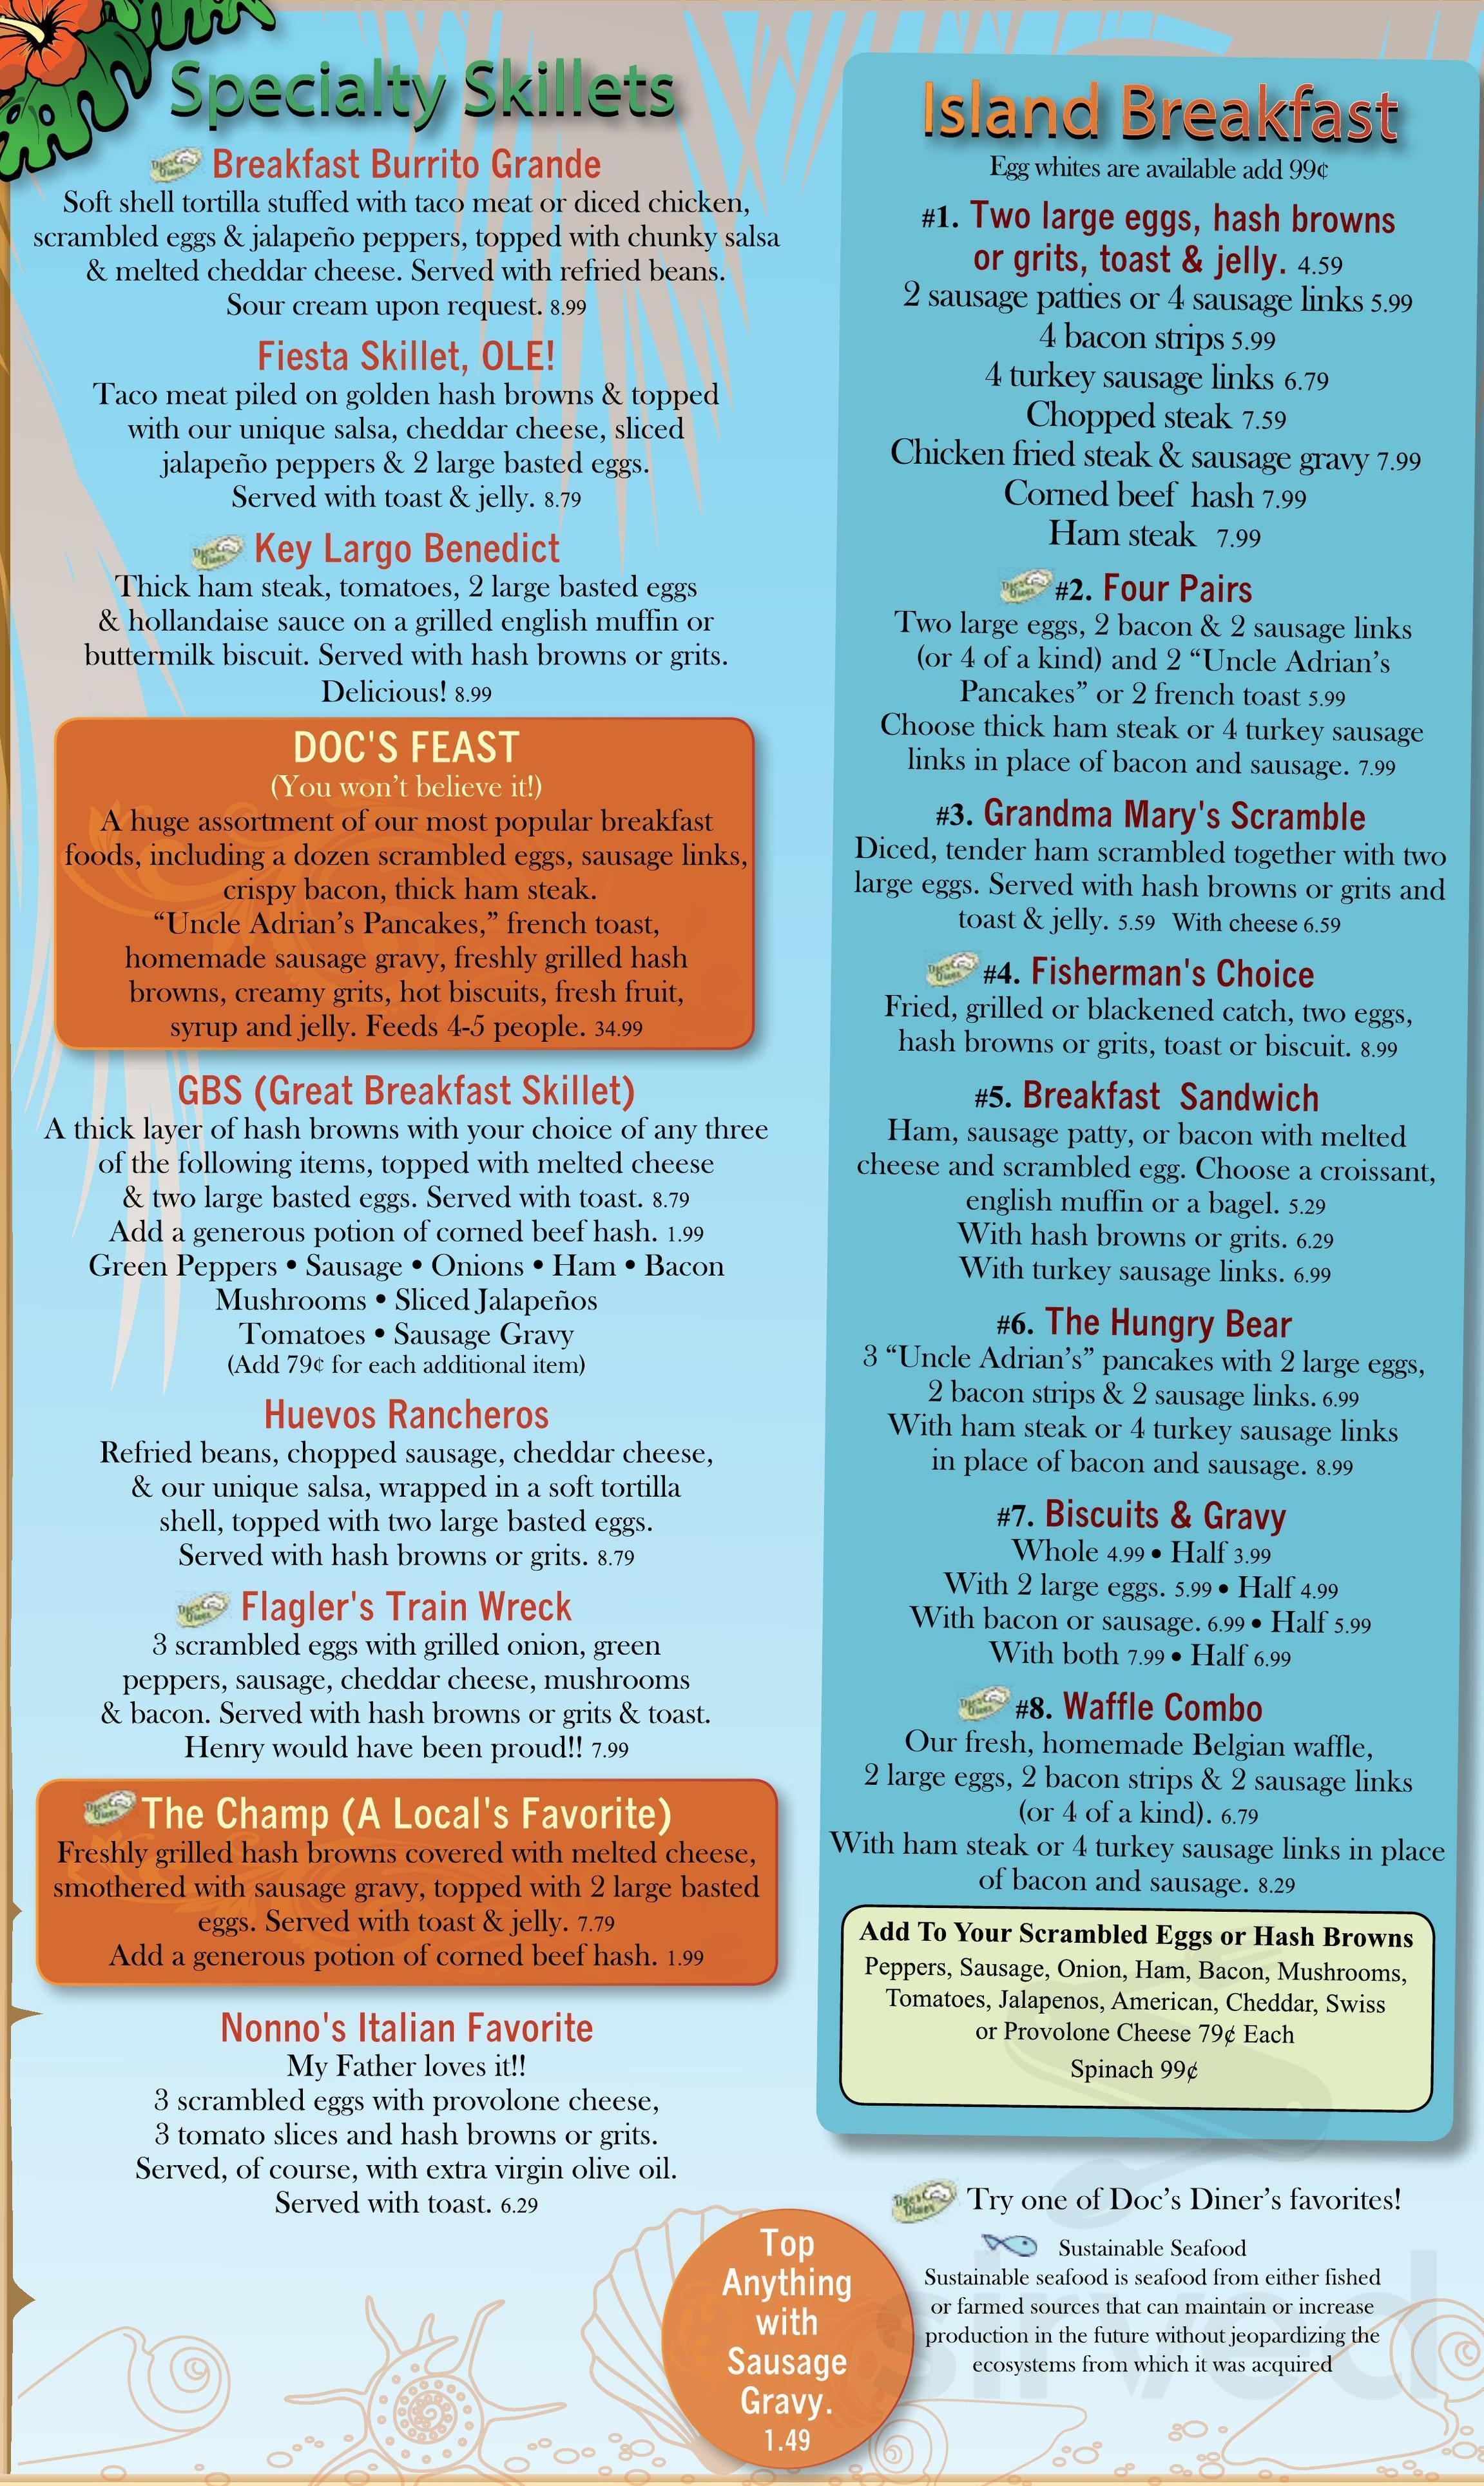 Doc's Diner menu in Loves Park, Illinois, USA